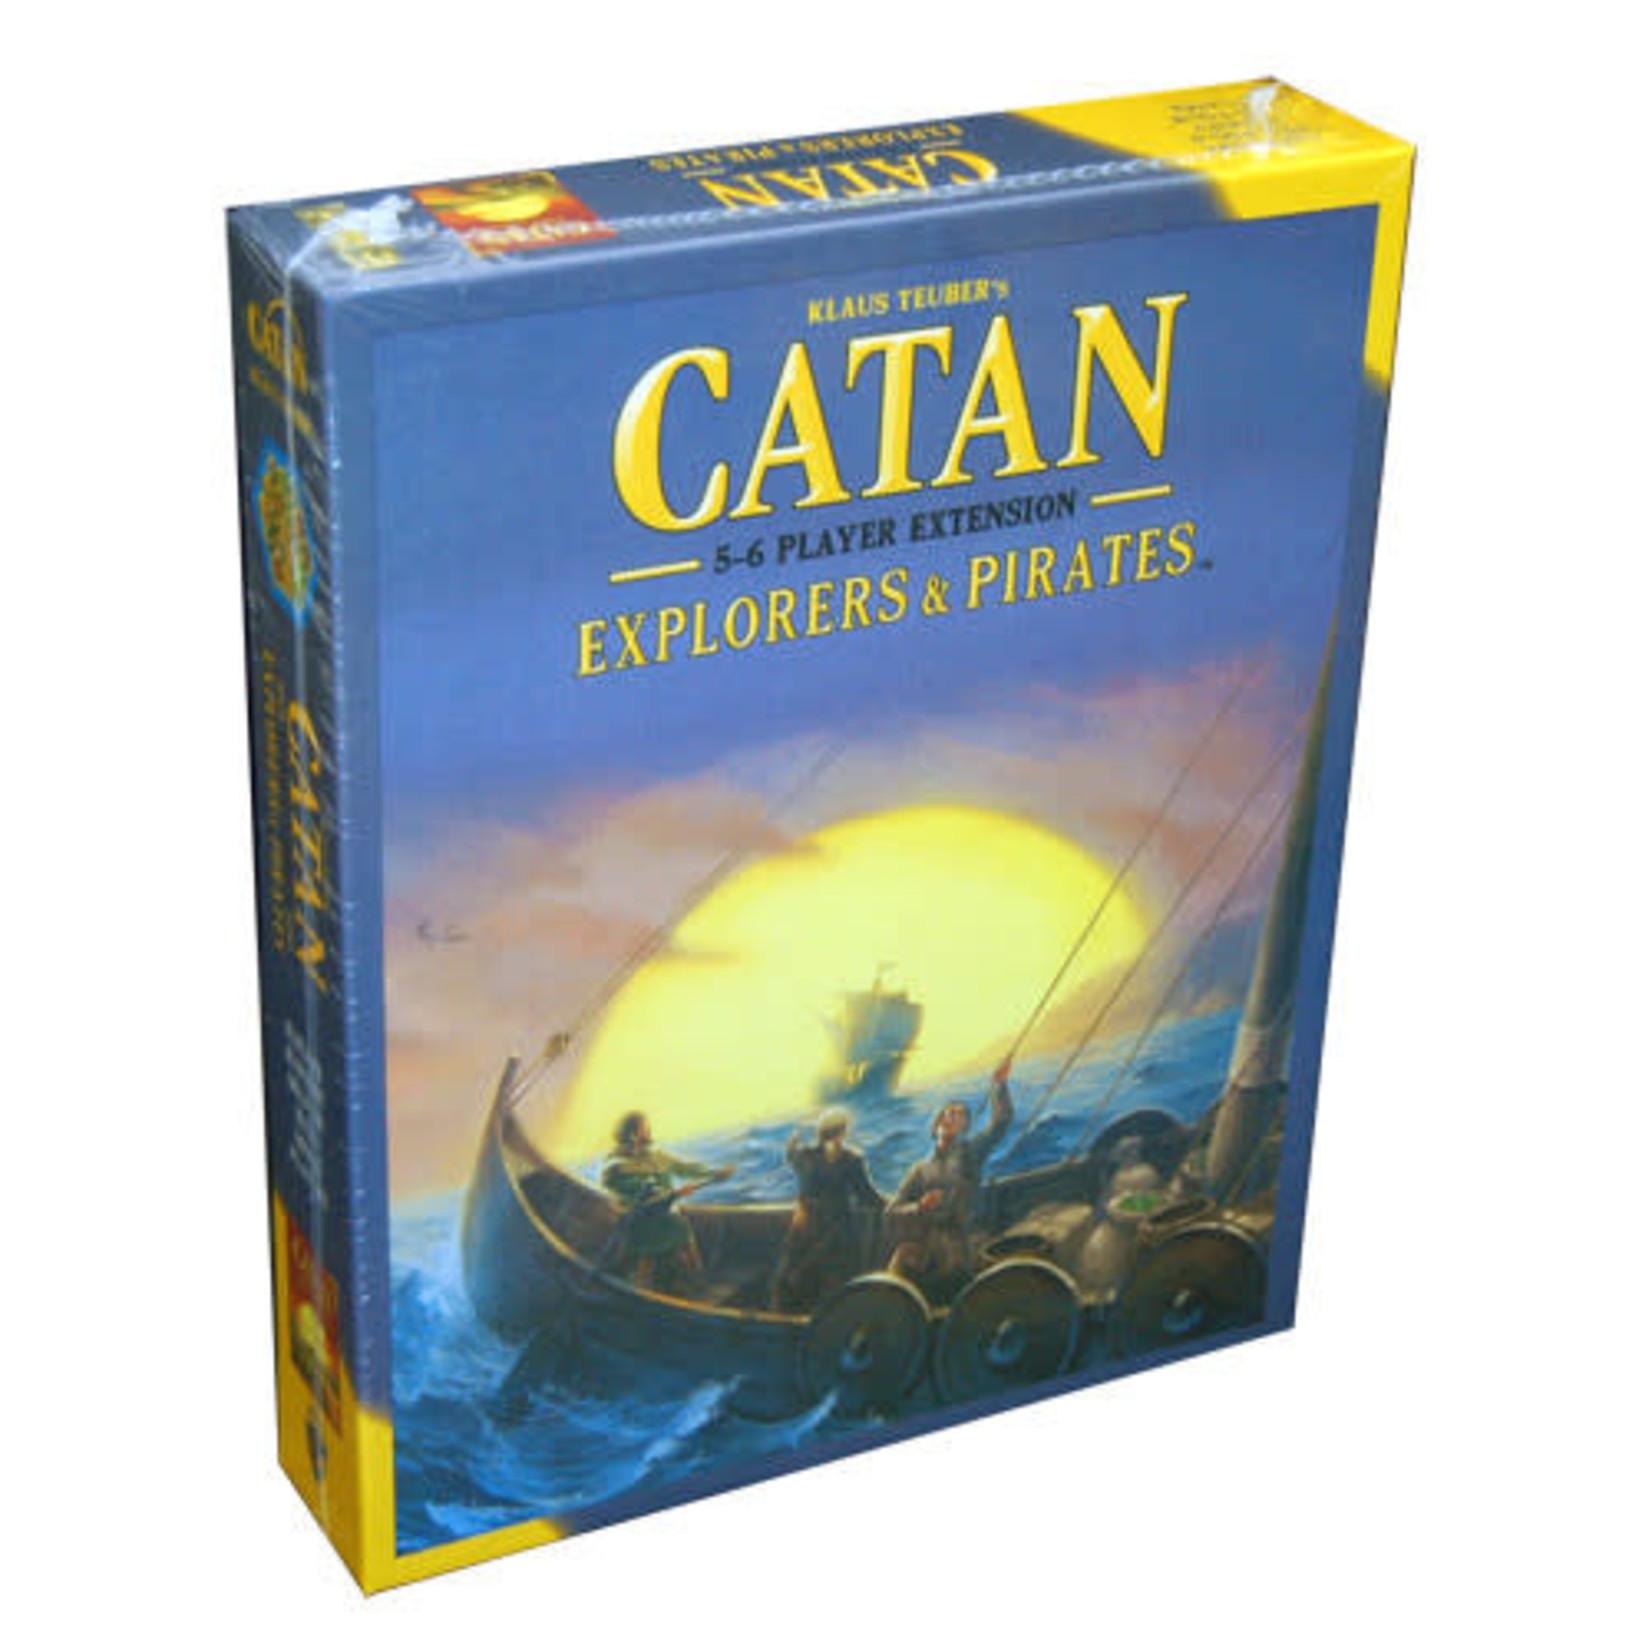 Catan Explorers & Pirates 5-6 Player Expansion Board Game